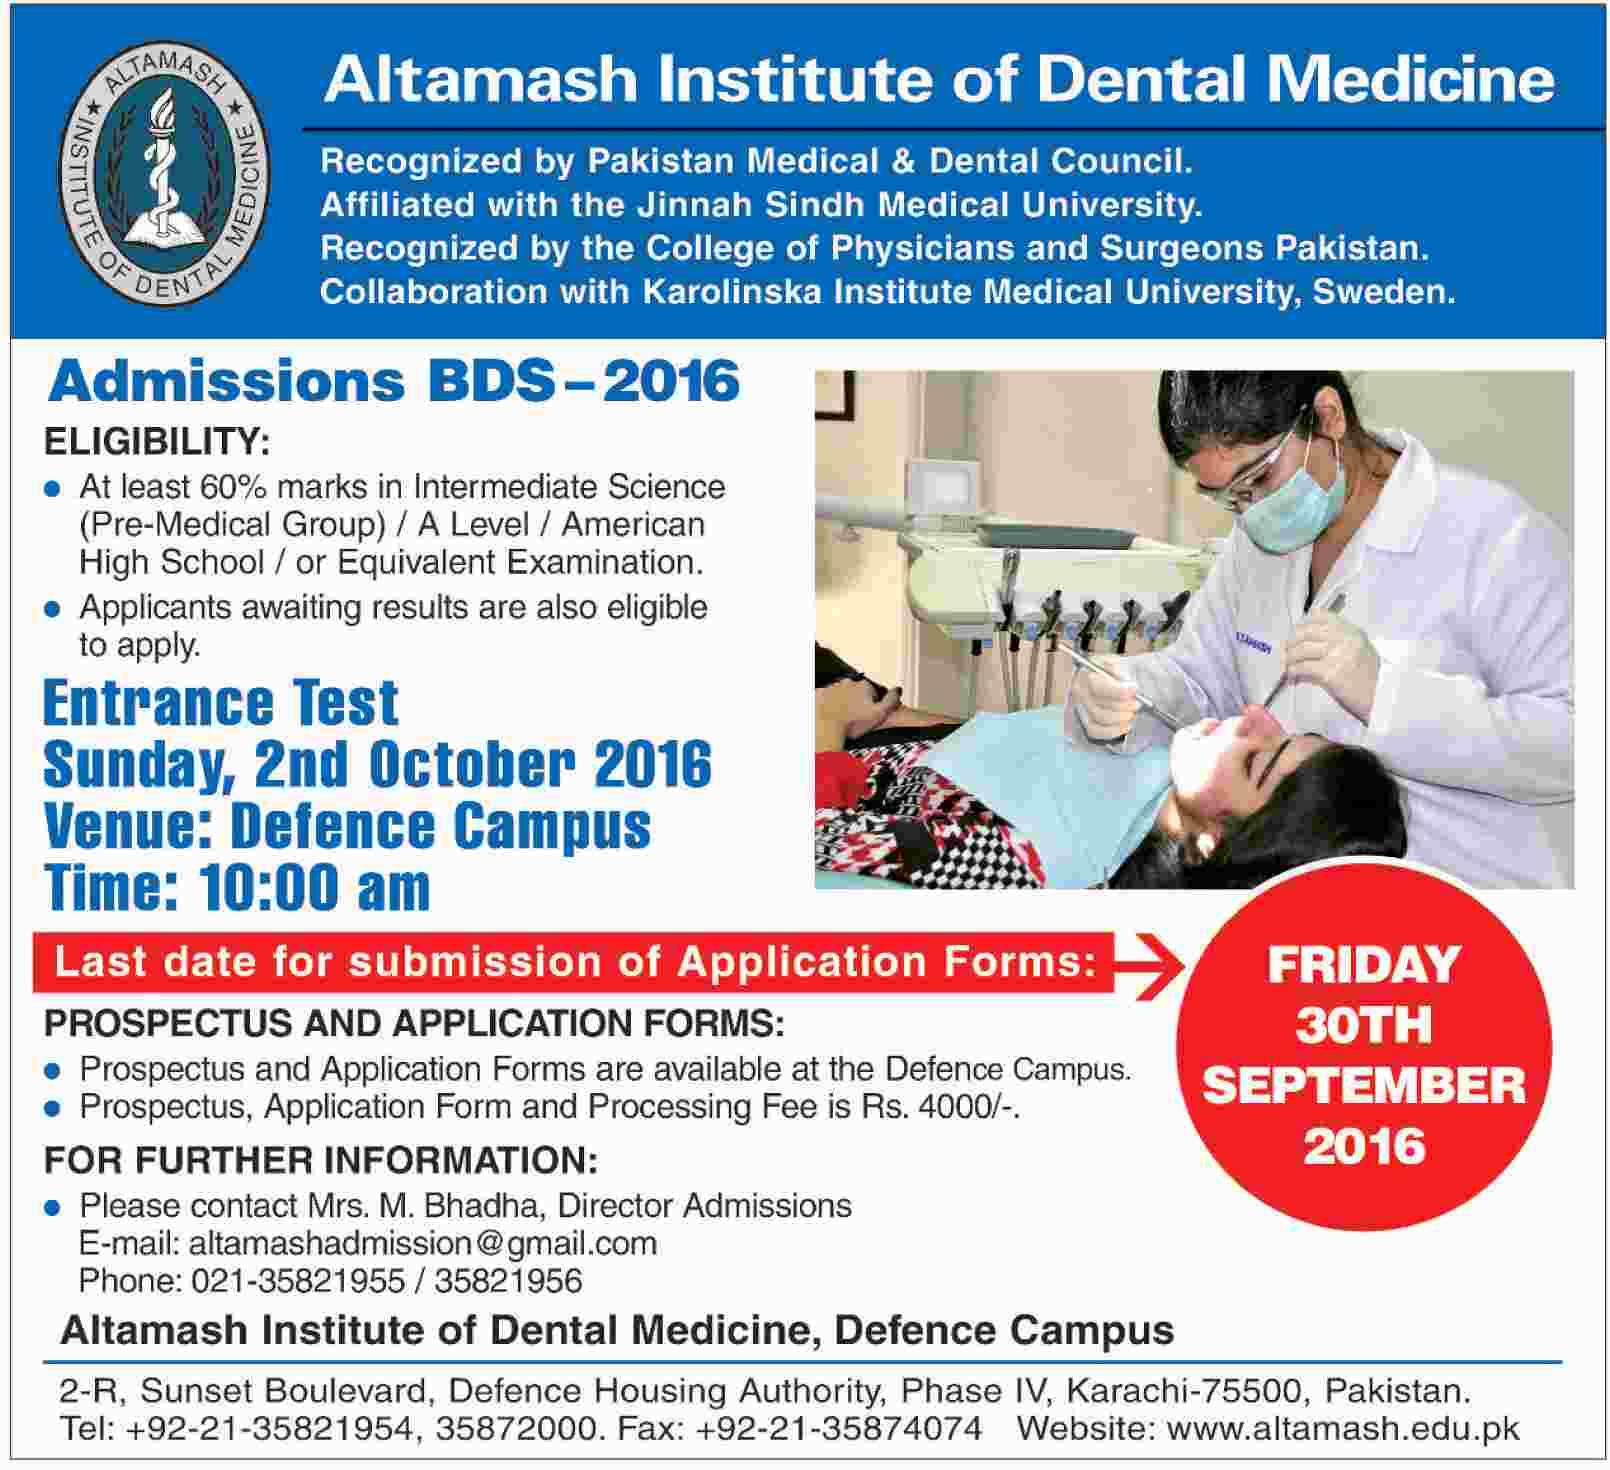 a description of the institute of medicine iom Institute of medicine (iom) in the us is now renamed the national academy of medicine (2015) institute of medicine may also refer to: institute of medicine, mandalay.